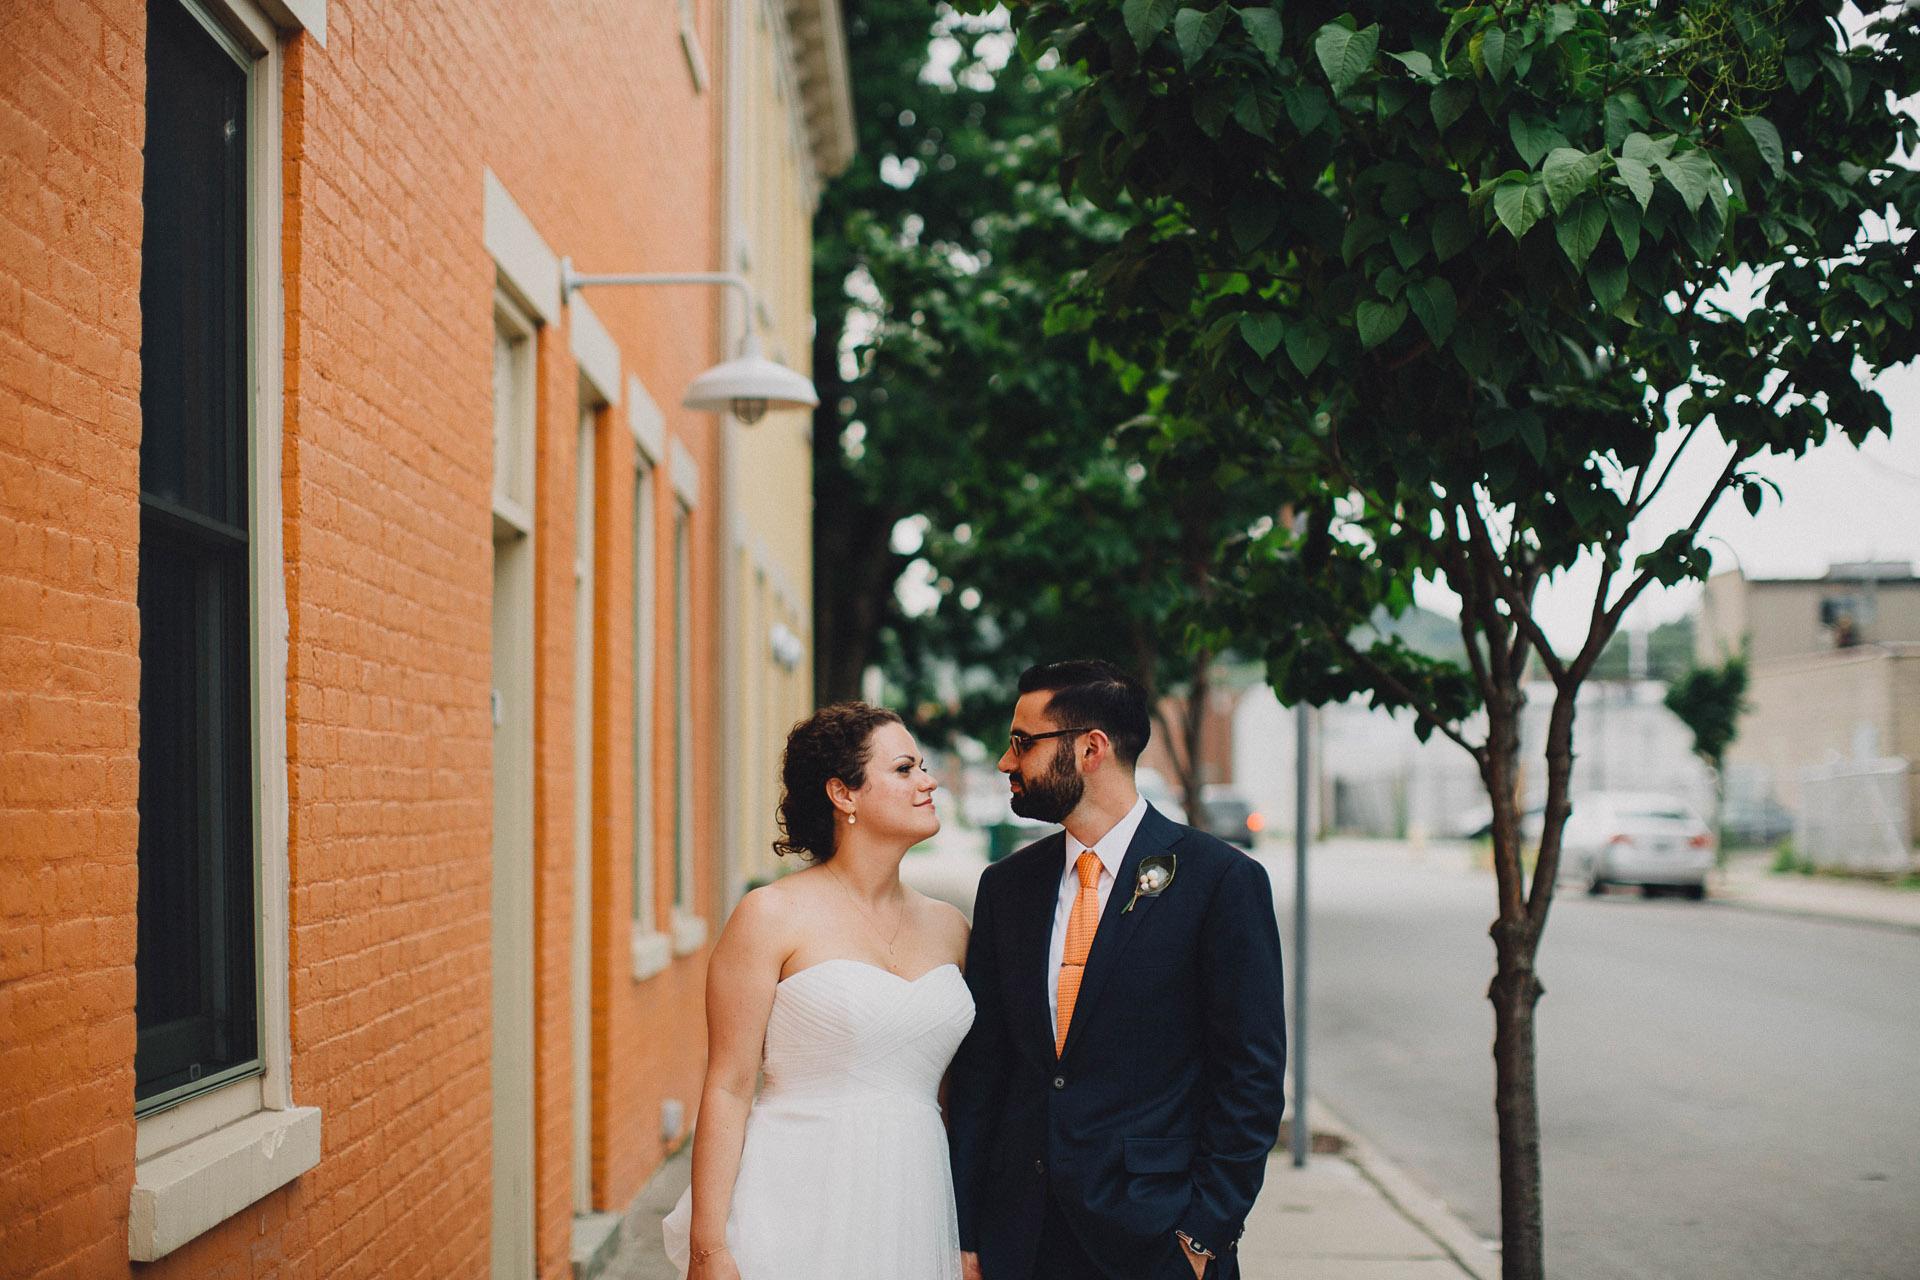 Bethany-Peter-Cincinnati-Pallet-23-Wedding-084.jpg